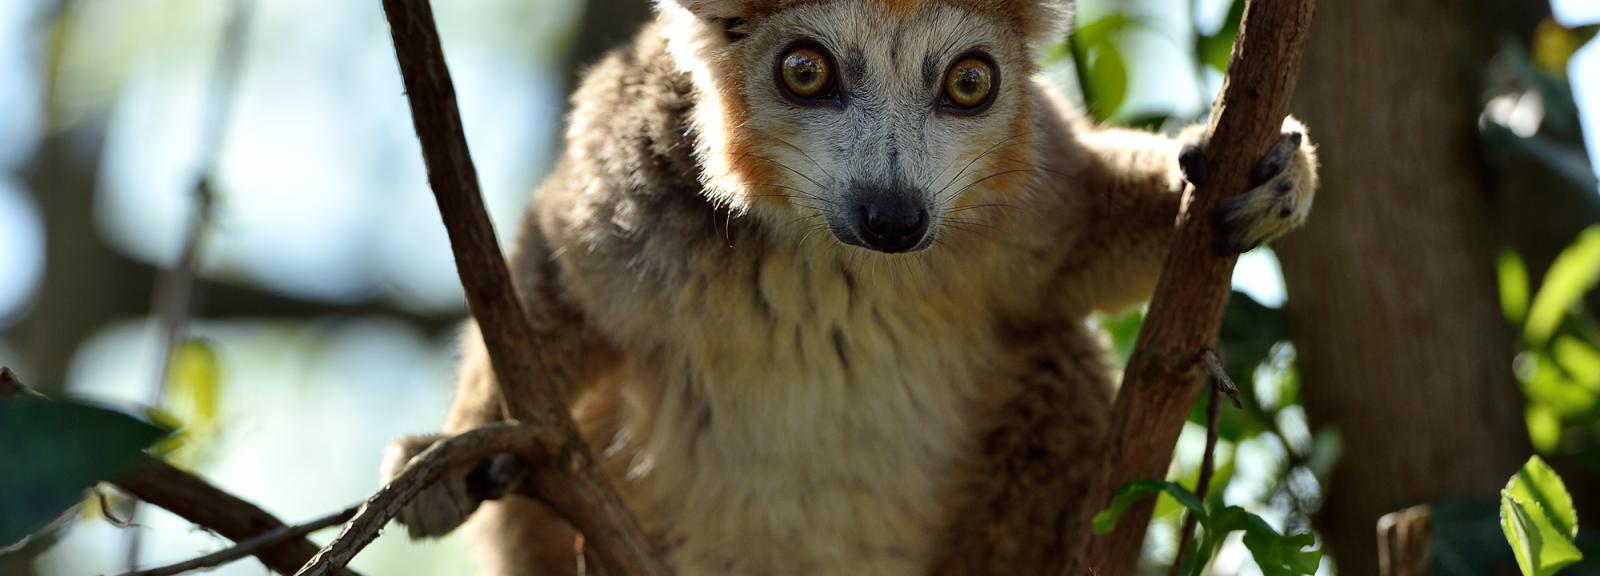 Lémur couronné © MNHN – F-G. Grandin